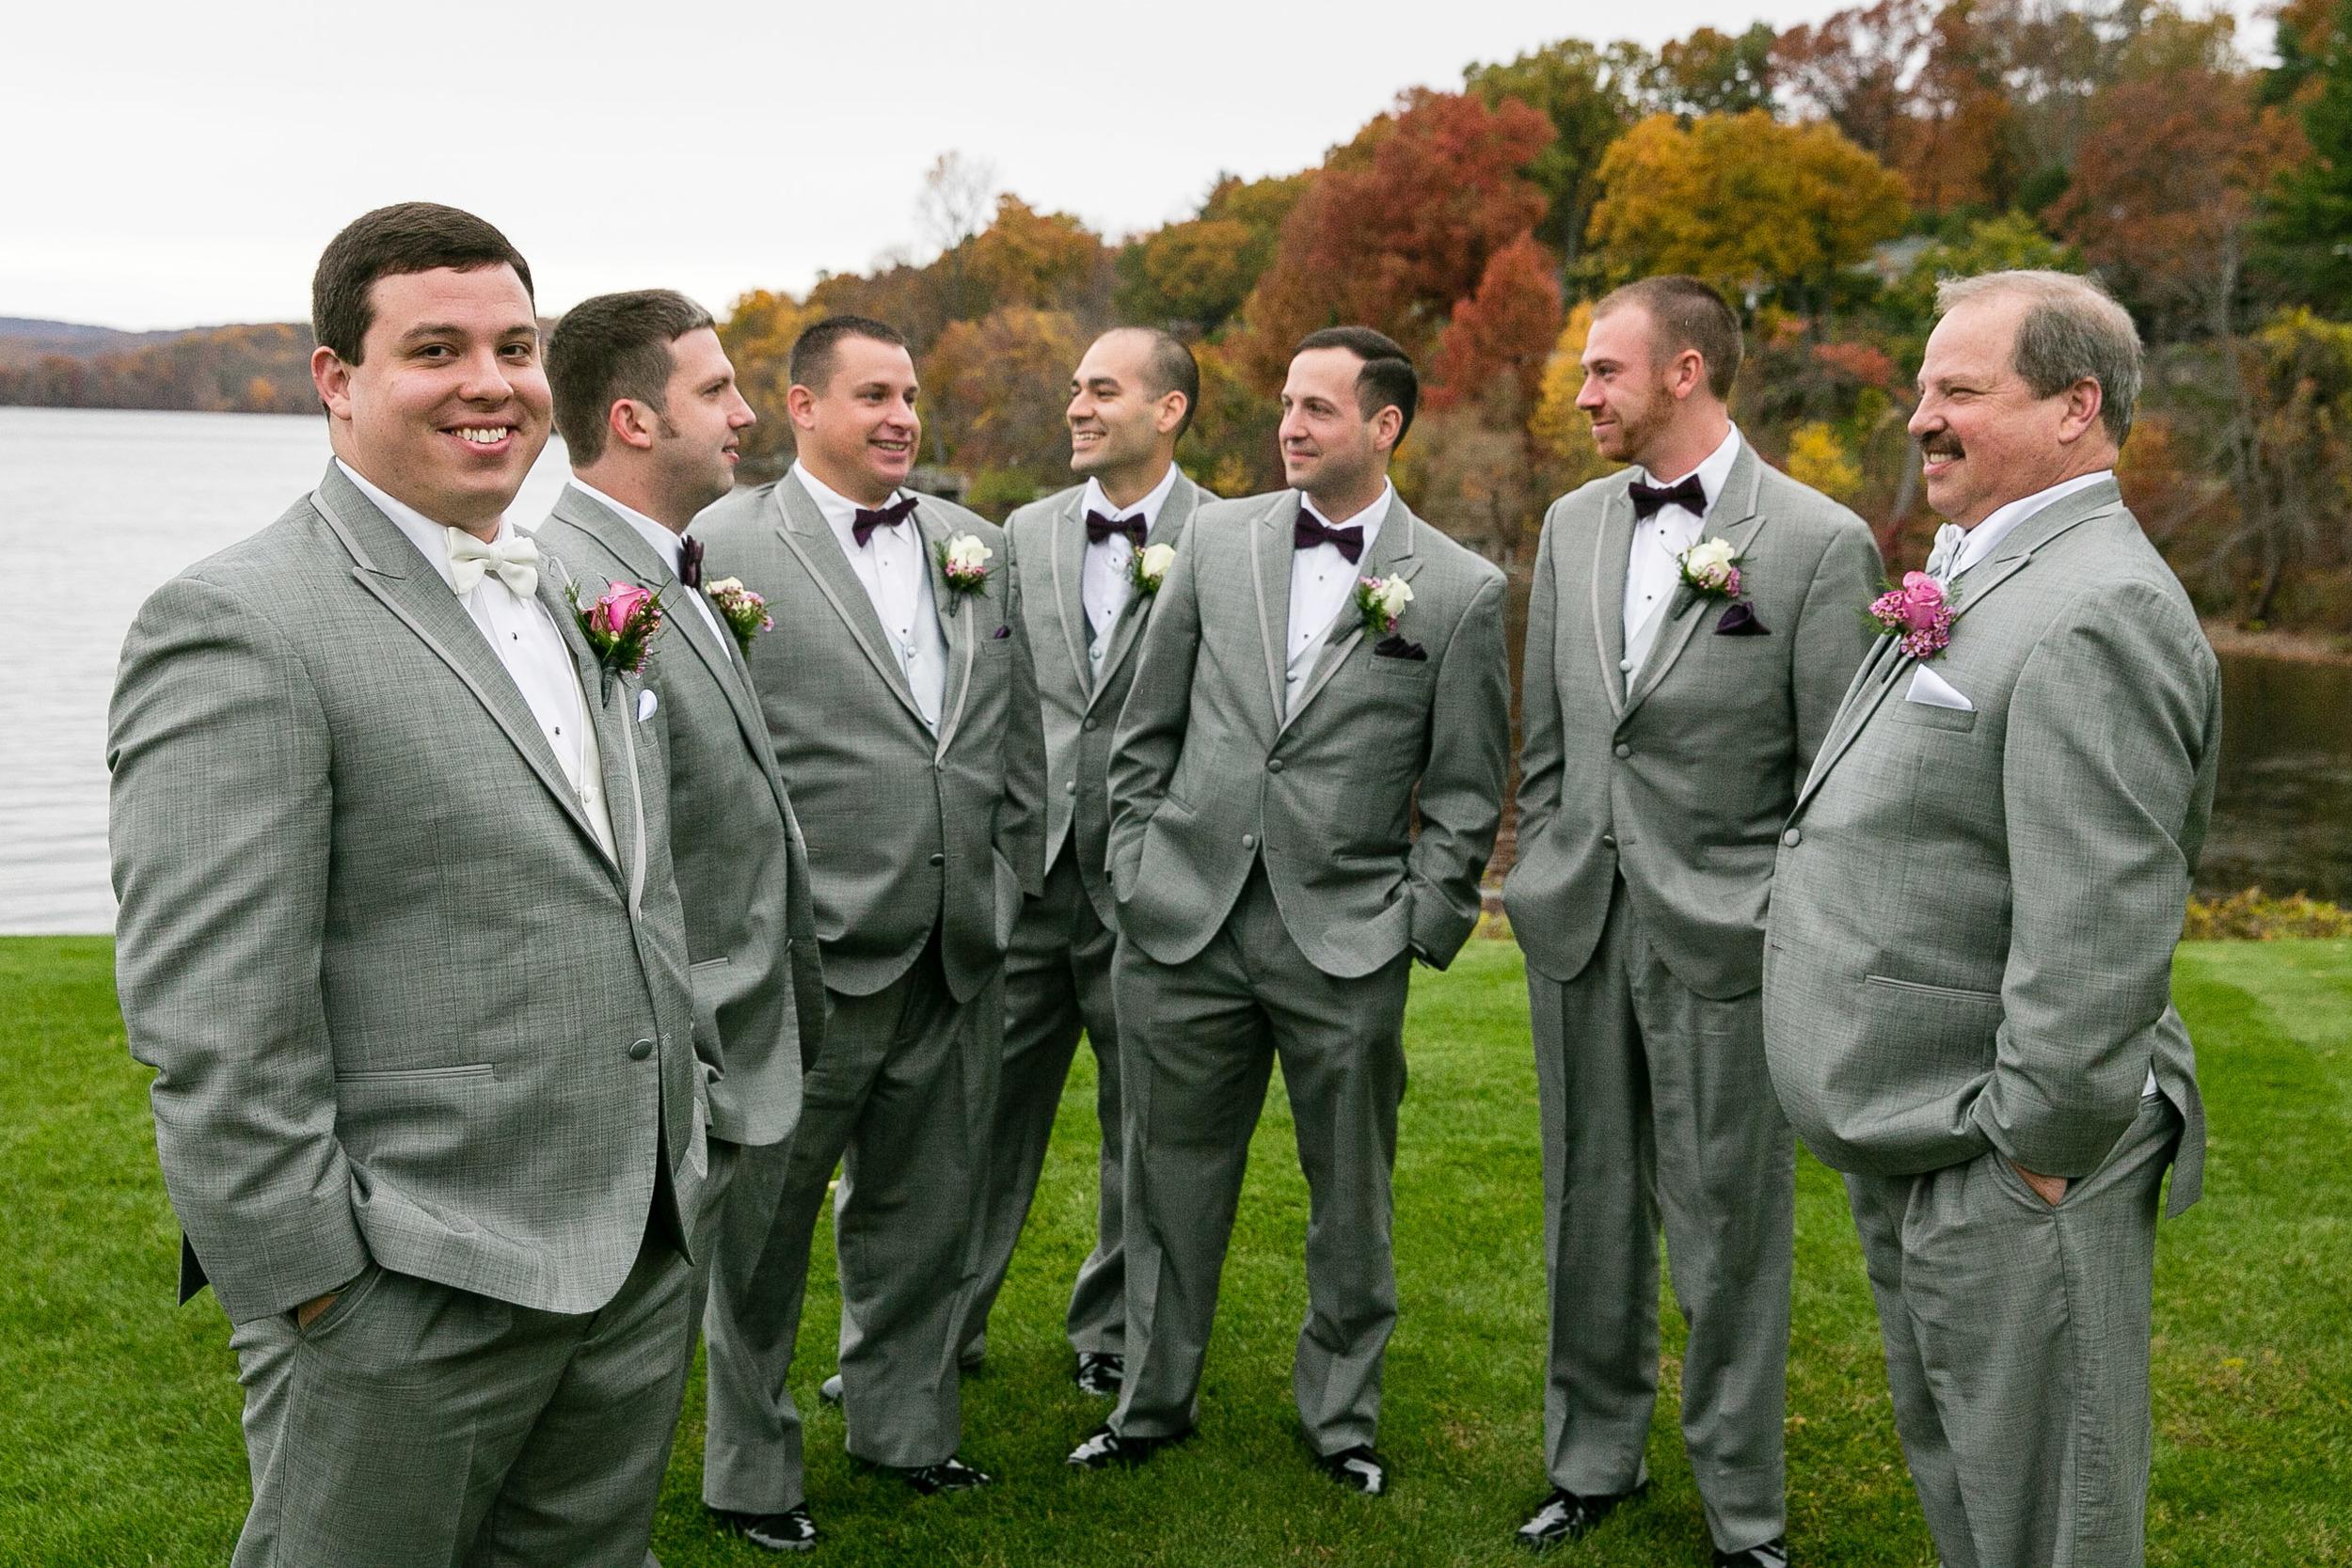 Connecticut-Fall-Wedding-Candlewood-Inn-CT-Documentary-Wedding-Photographer-Jacek-Dolata-111-2.jpg